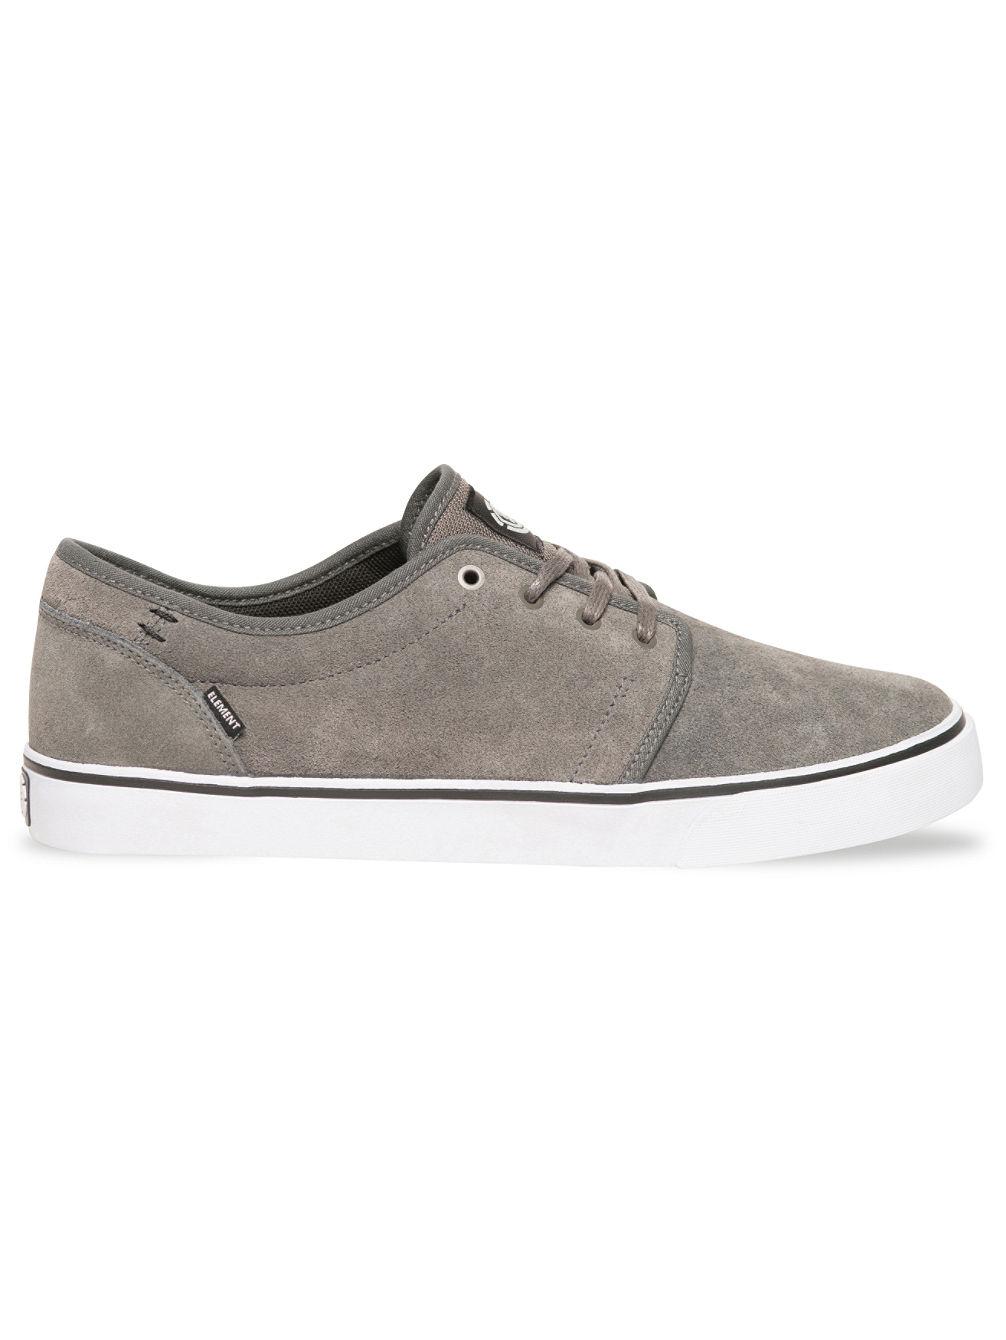 element-darwin-sneakers